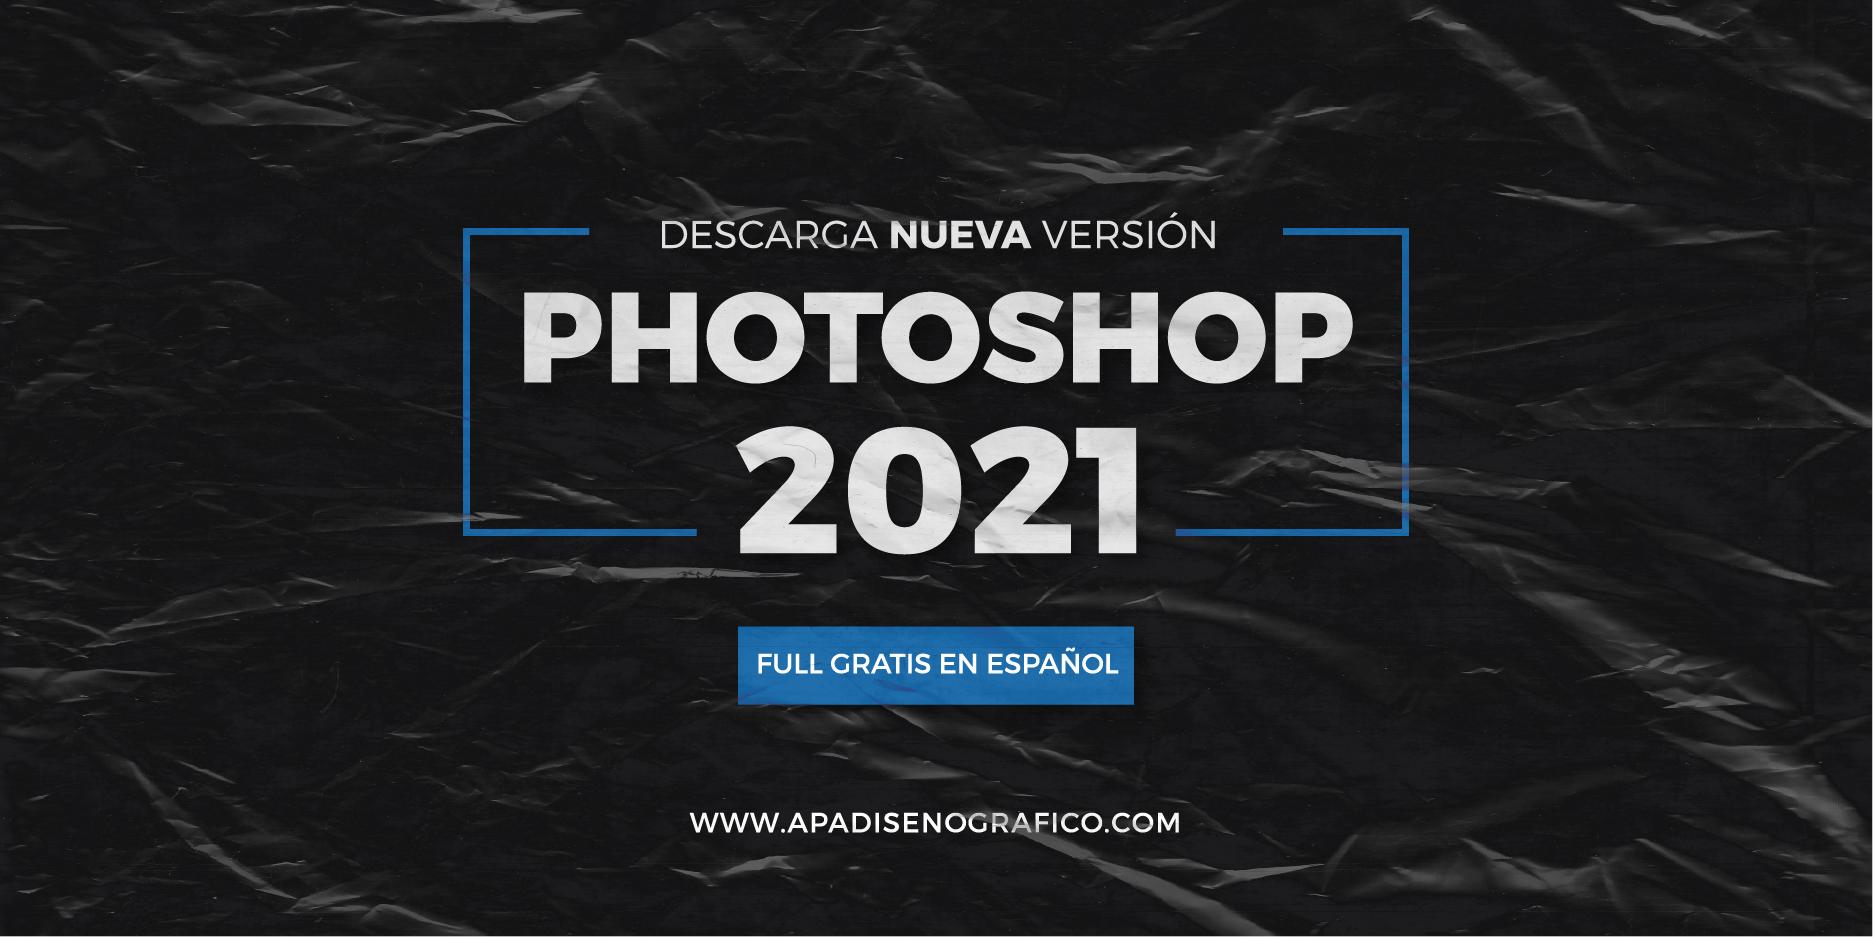 Adobe photoshop 2021 full gratis windows 64 bits español